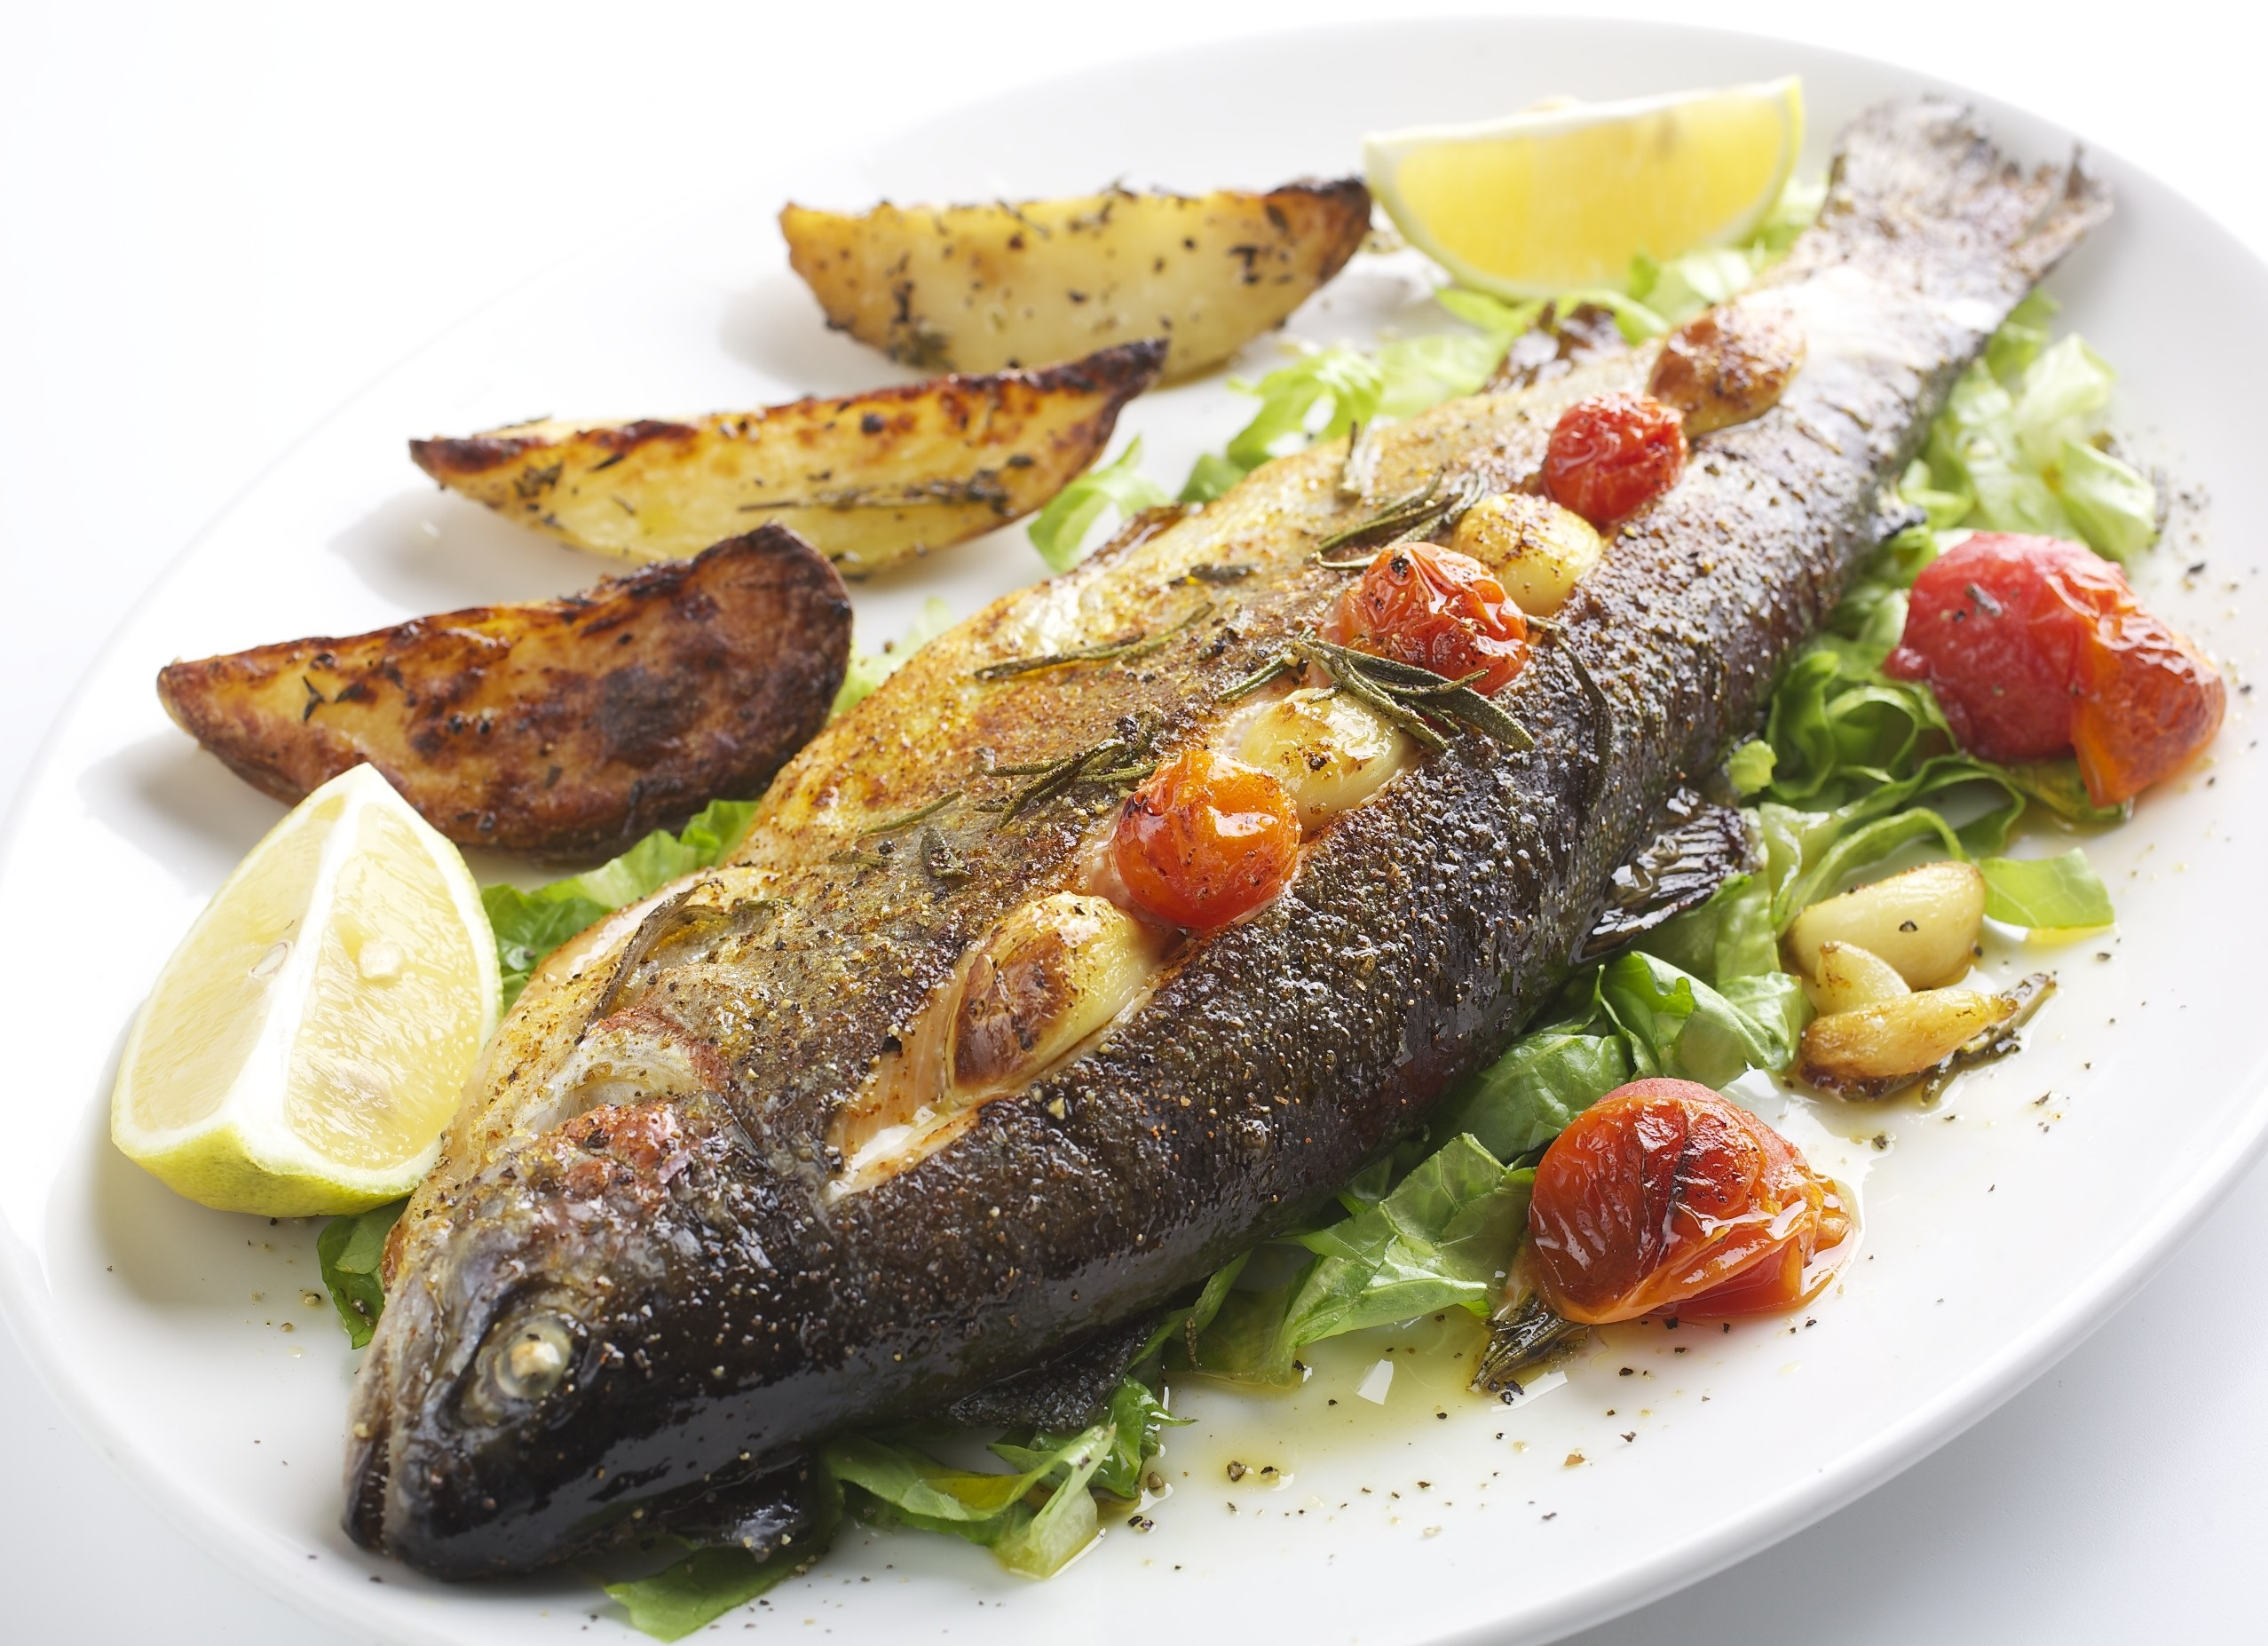 «Звездная рыба», изюминка ресторана Мисэдэт-а-Даягим